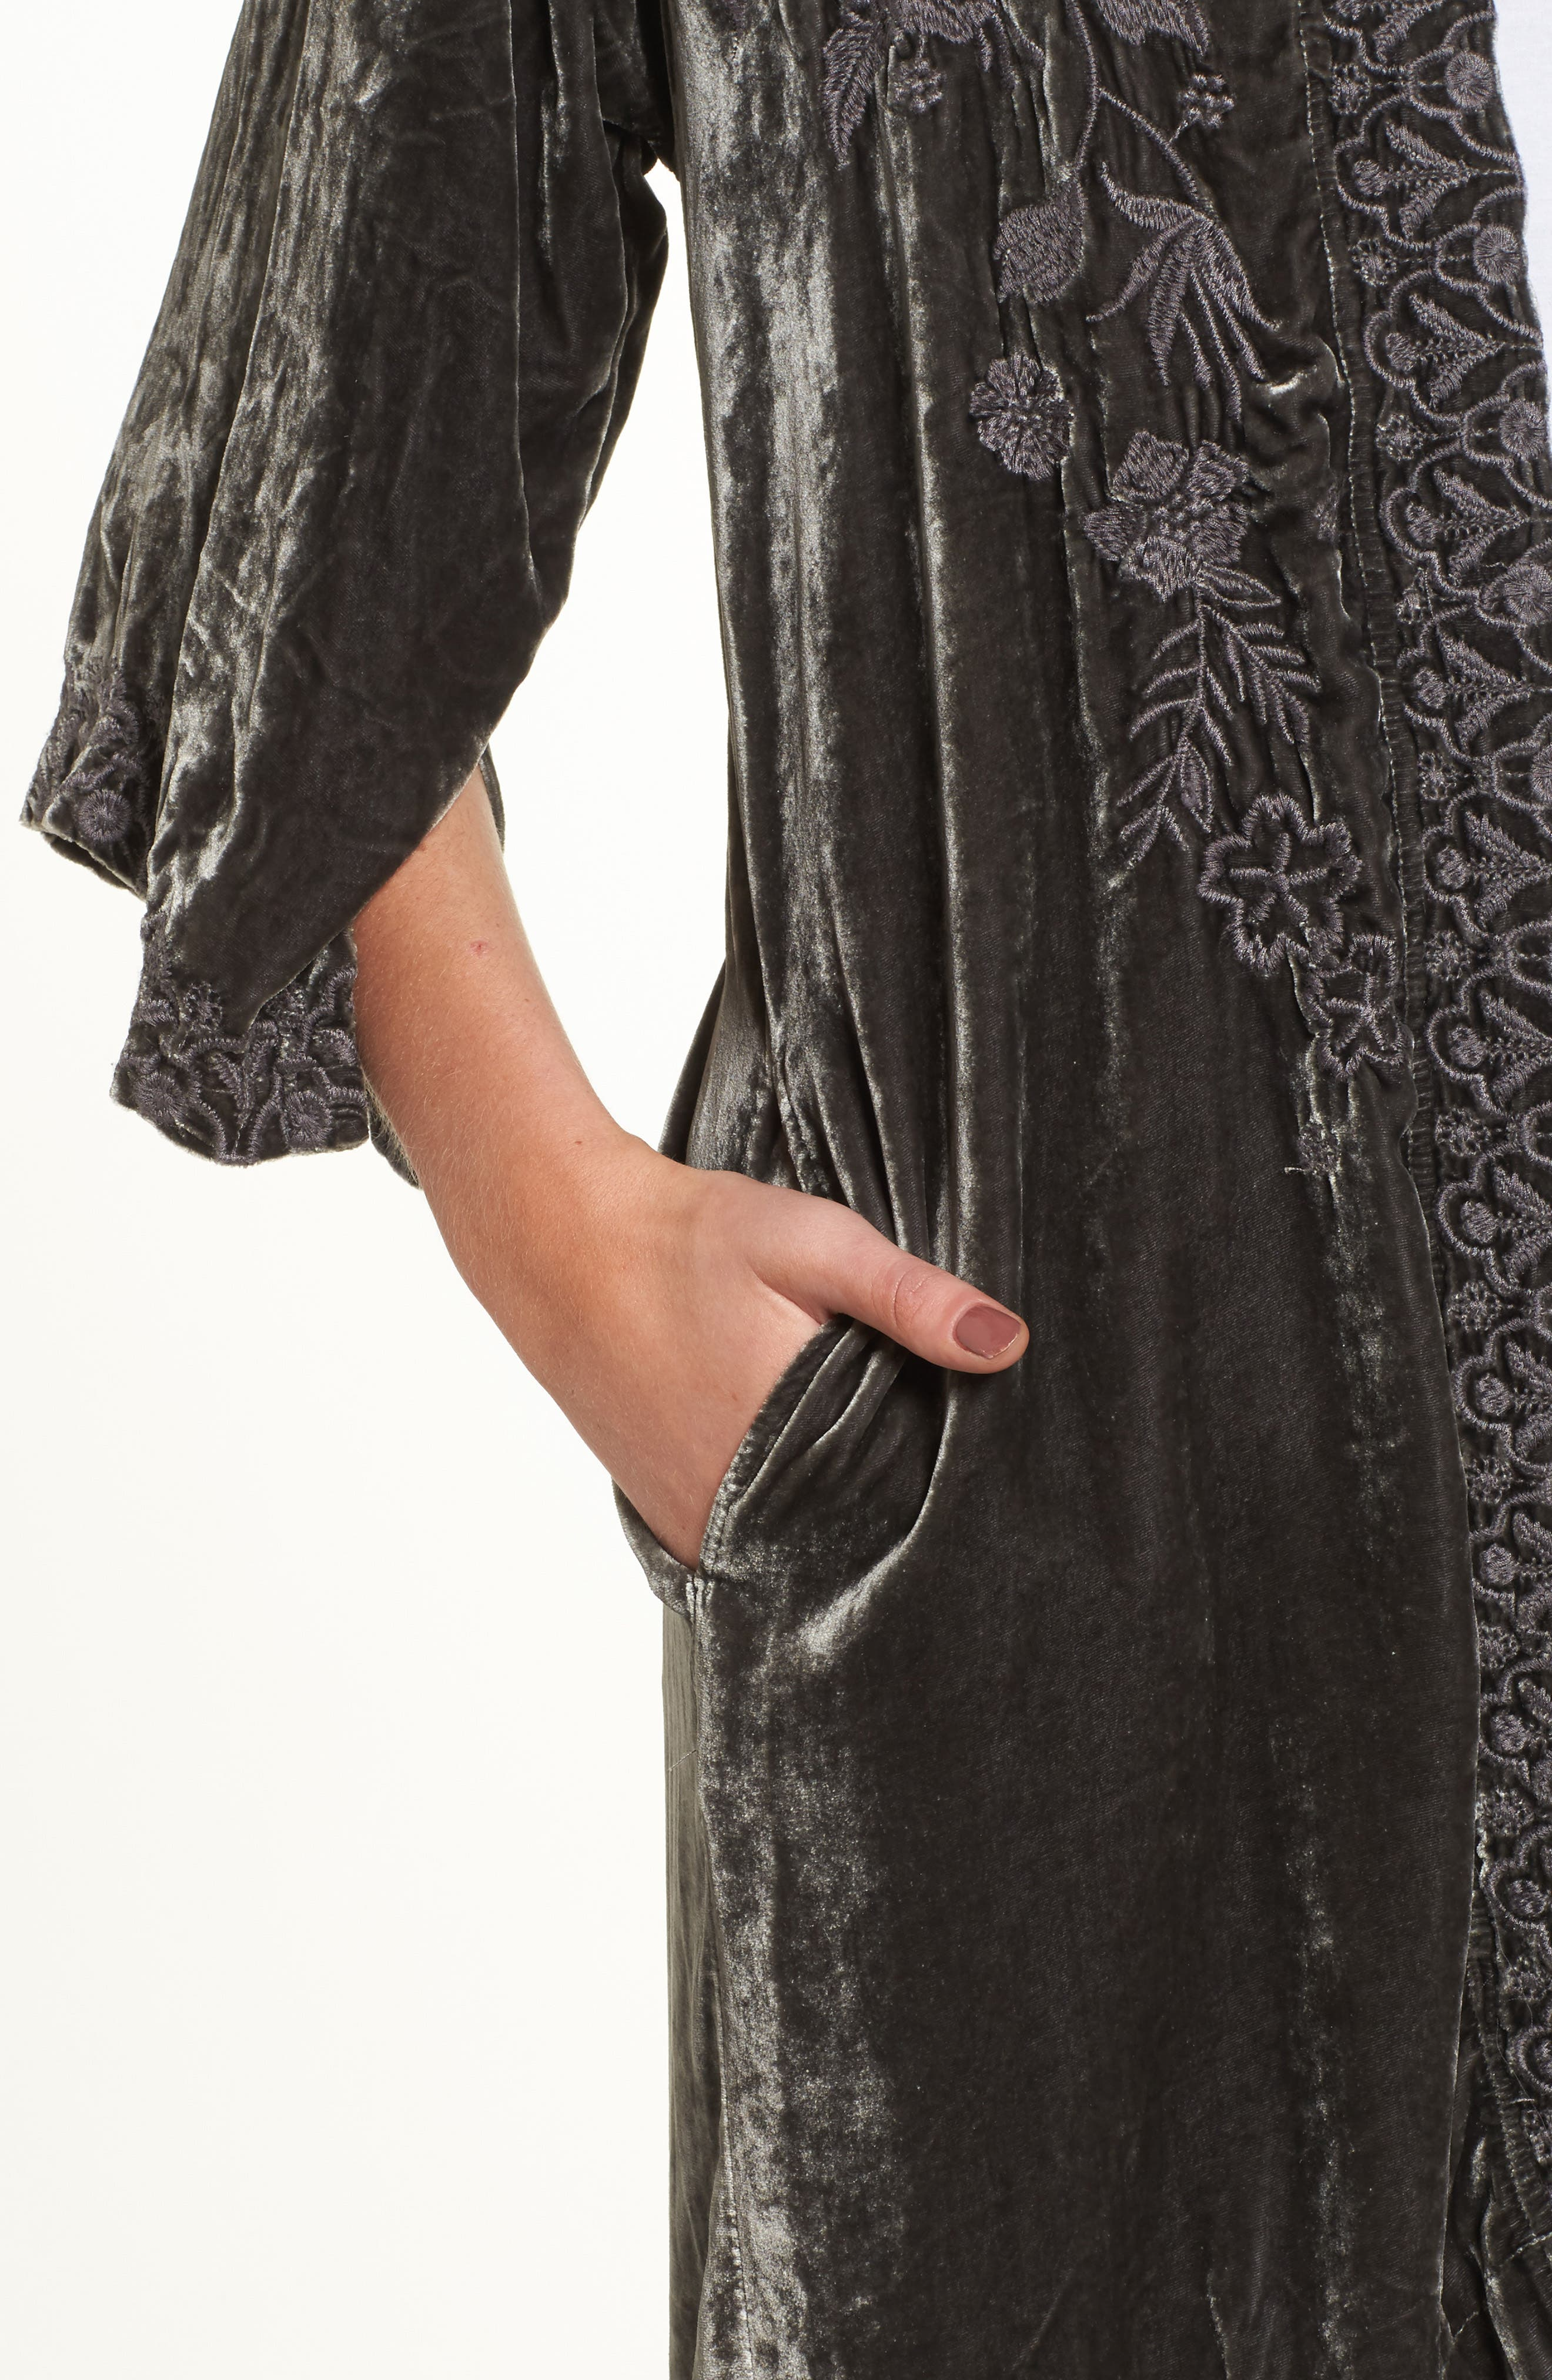 Parina Embroidered Velvet Kimono,                             Alternate thumbnail 4, color,                             072